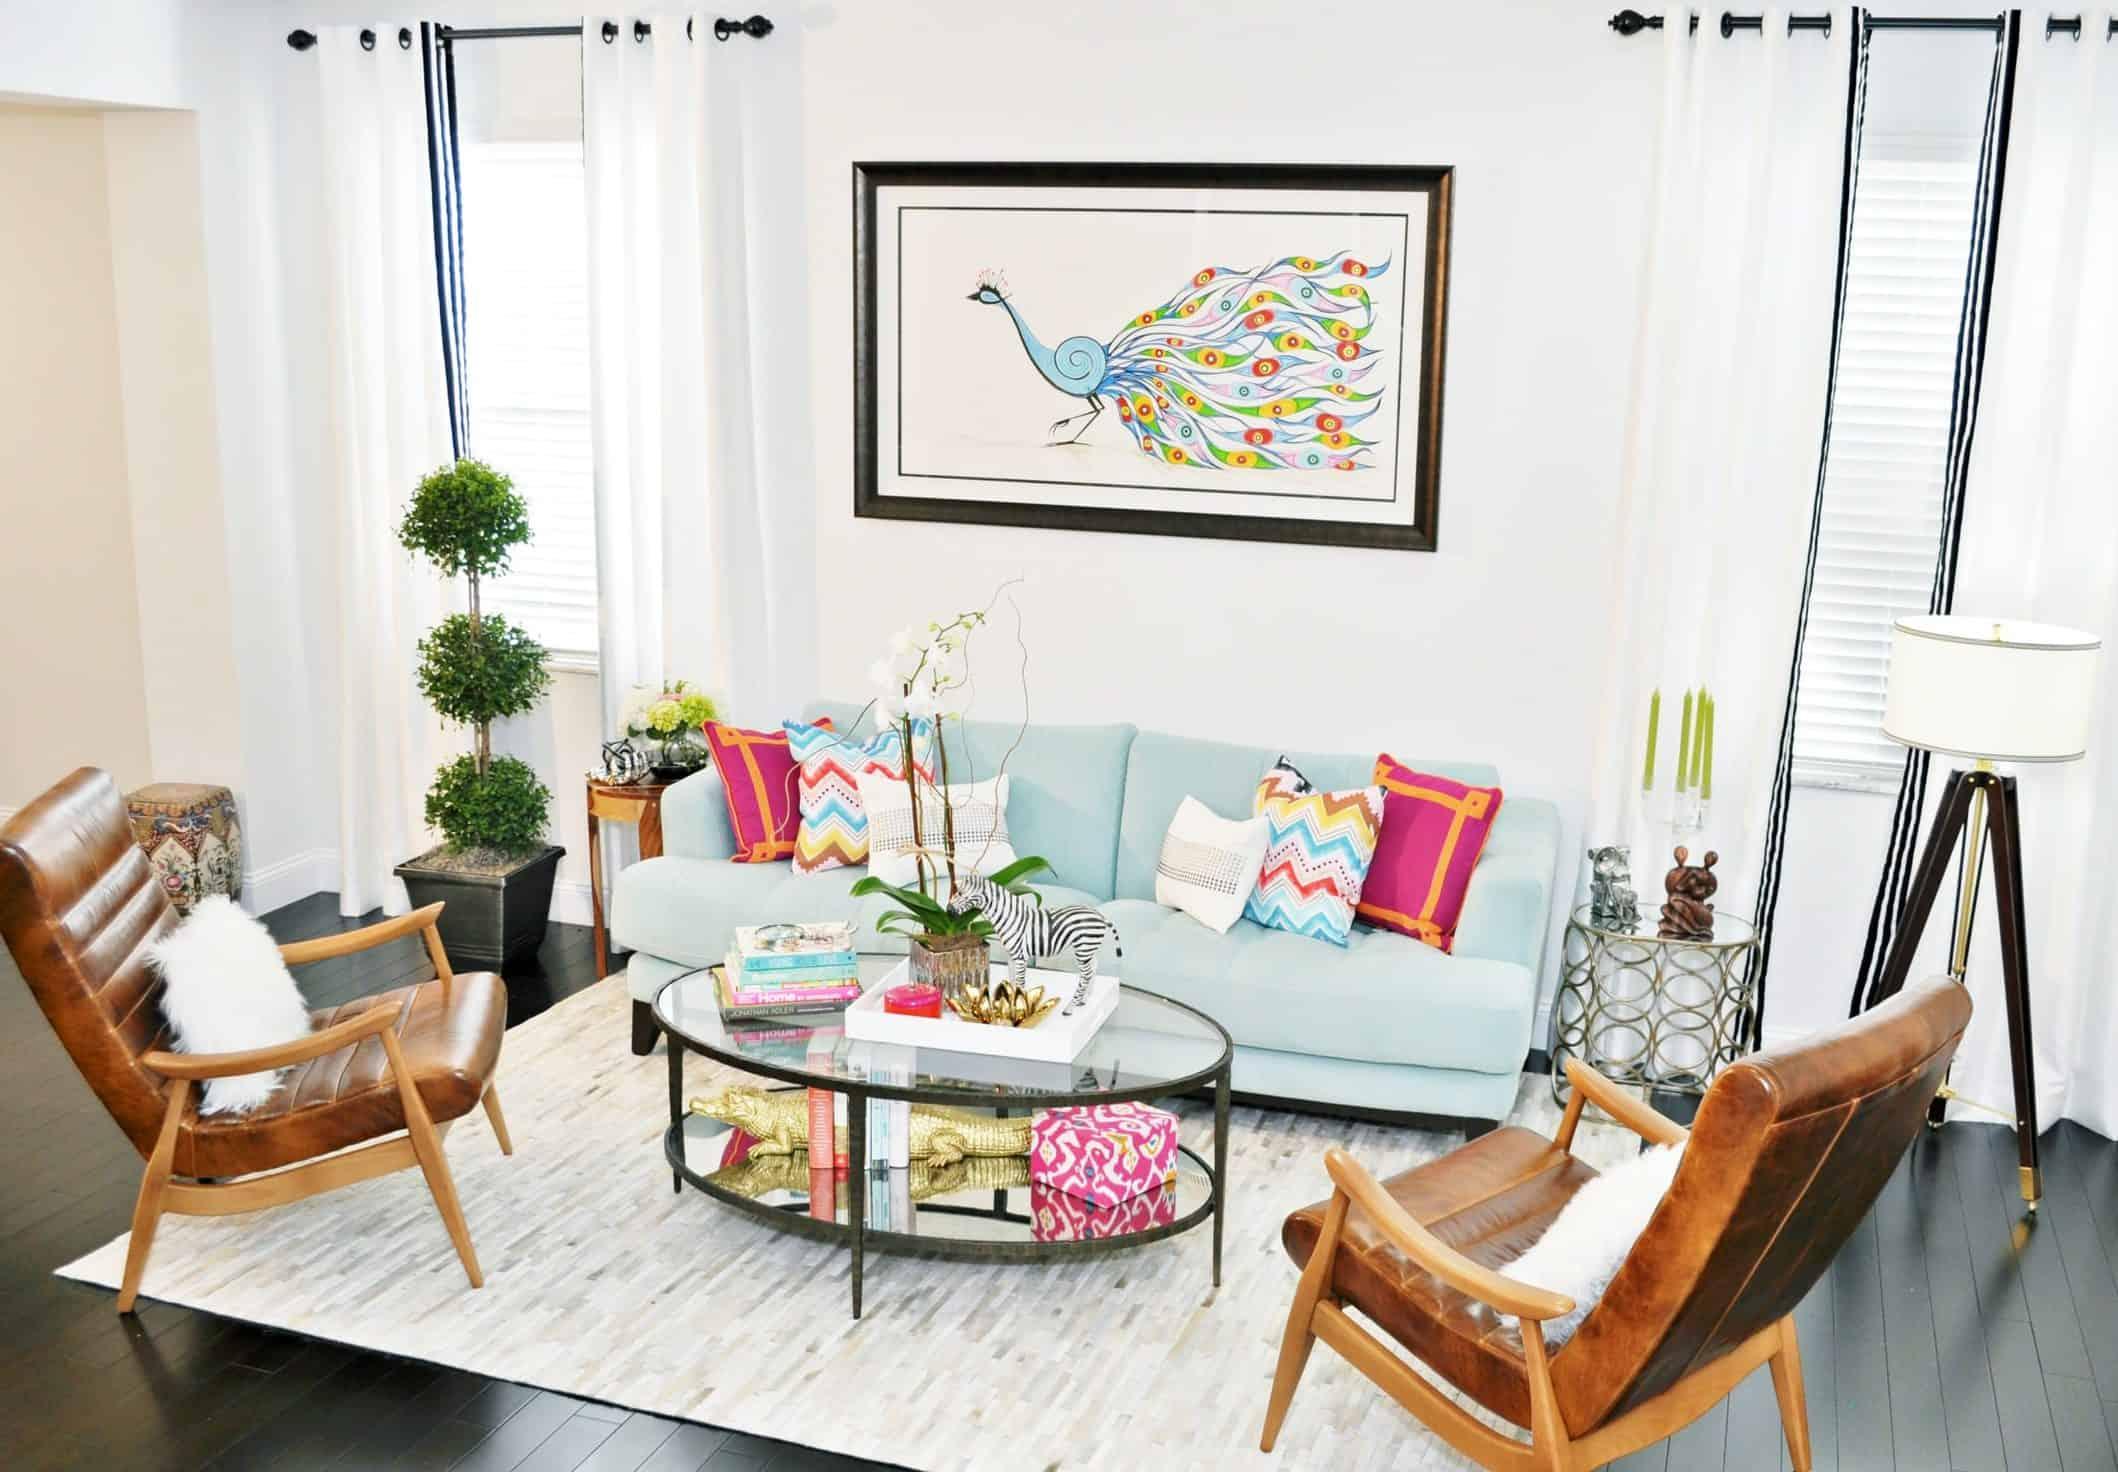 Peacock Living Room Decor 40 Peacock Decor Ideas Art Accessories Furniture Photos